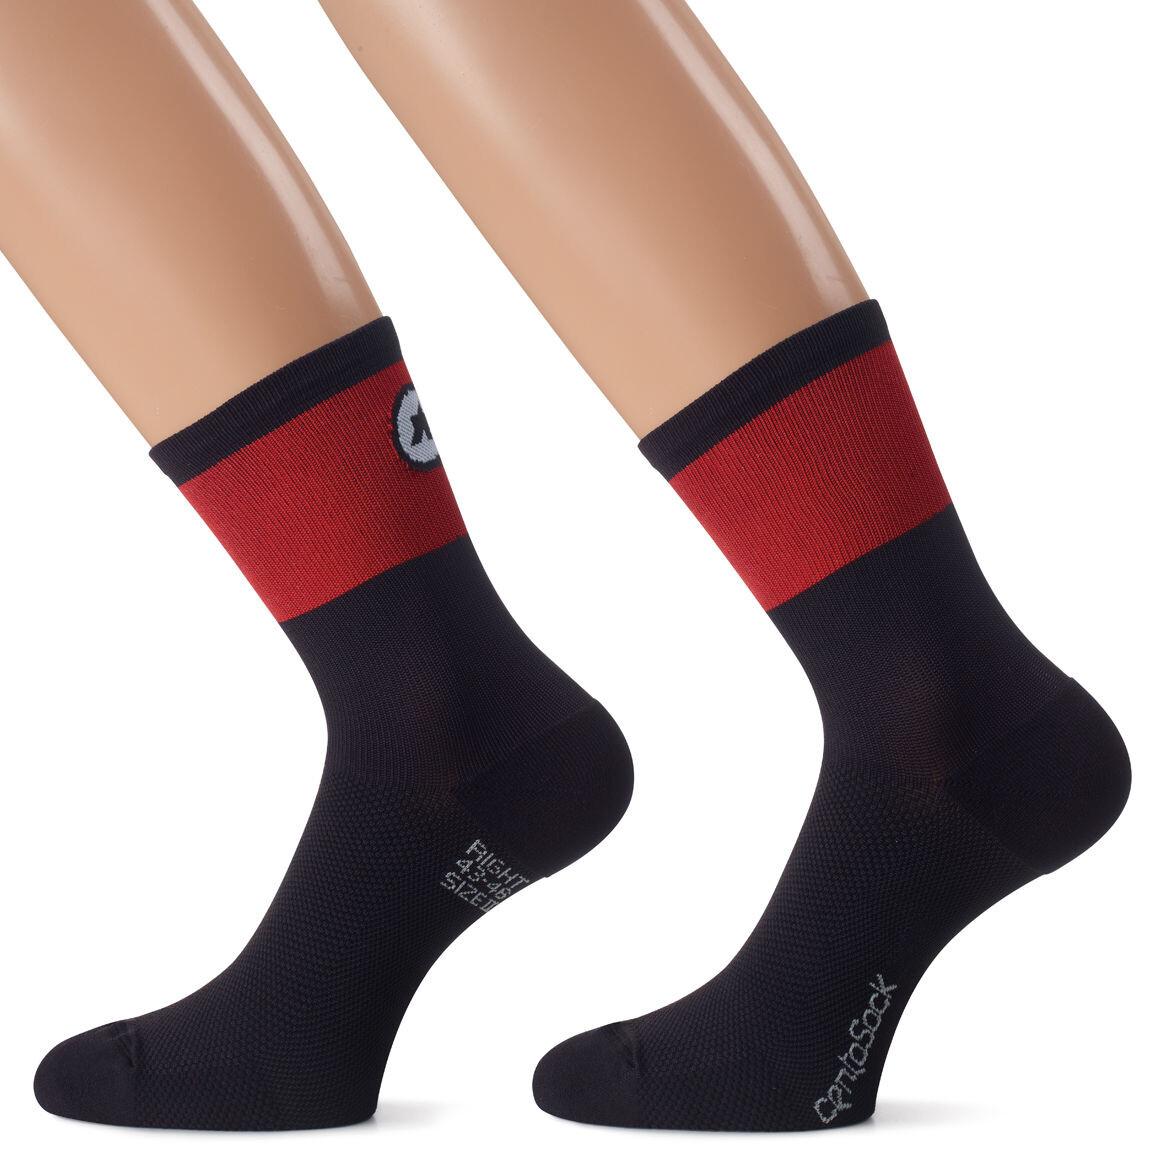 assos CentoSocks_Evo8, national red | Socks